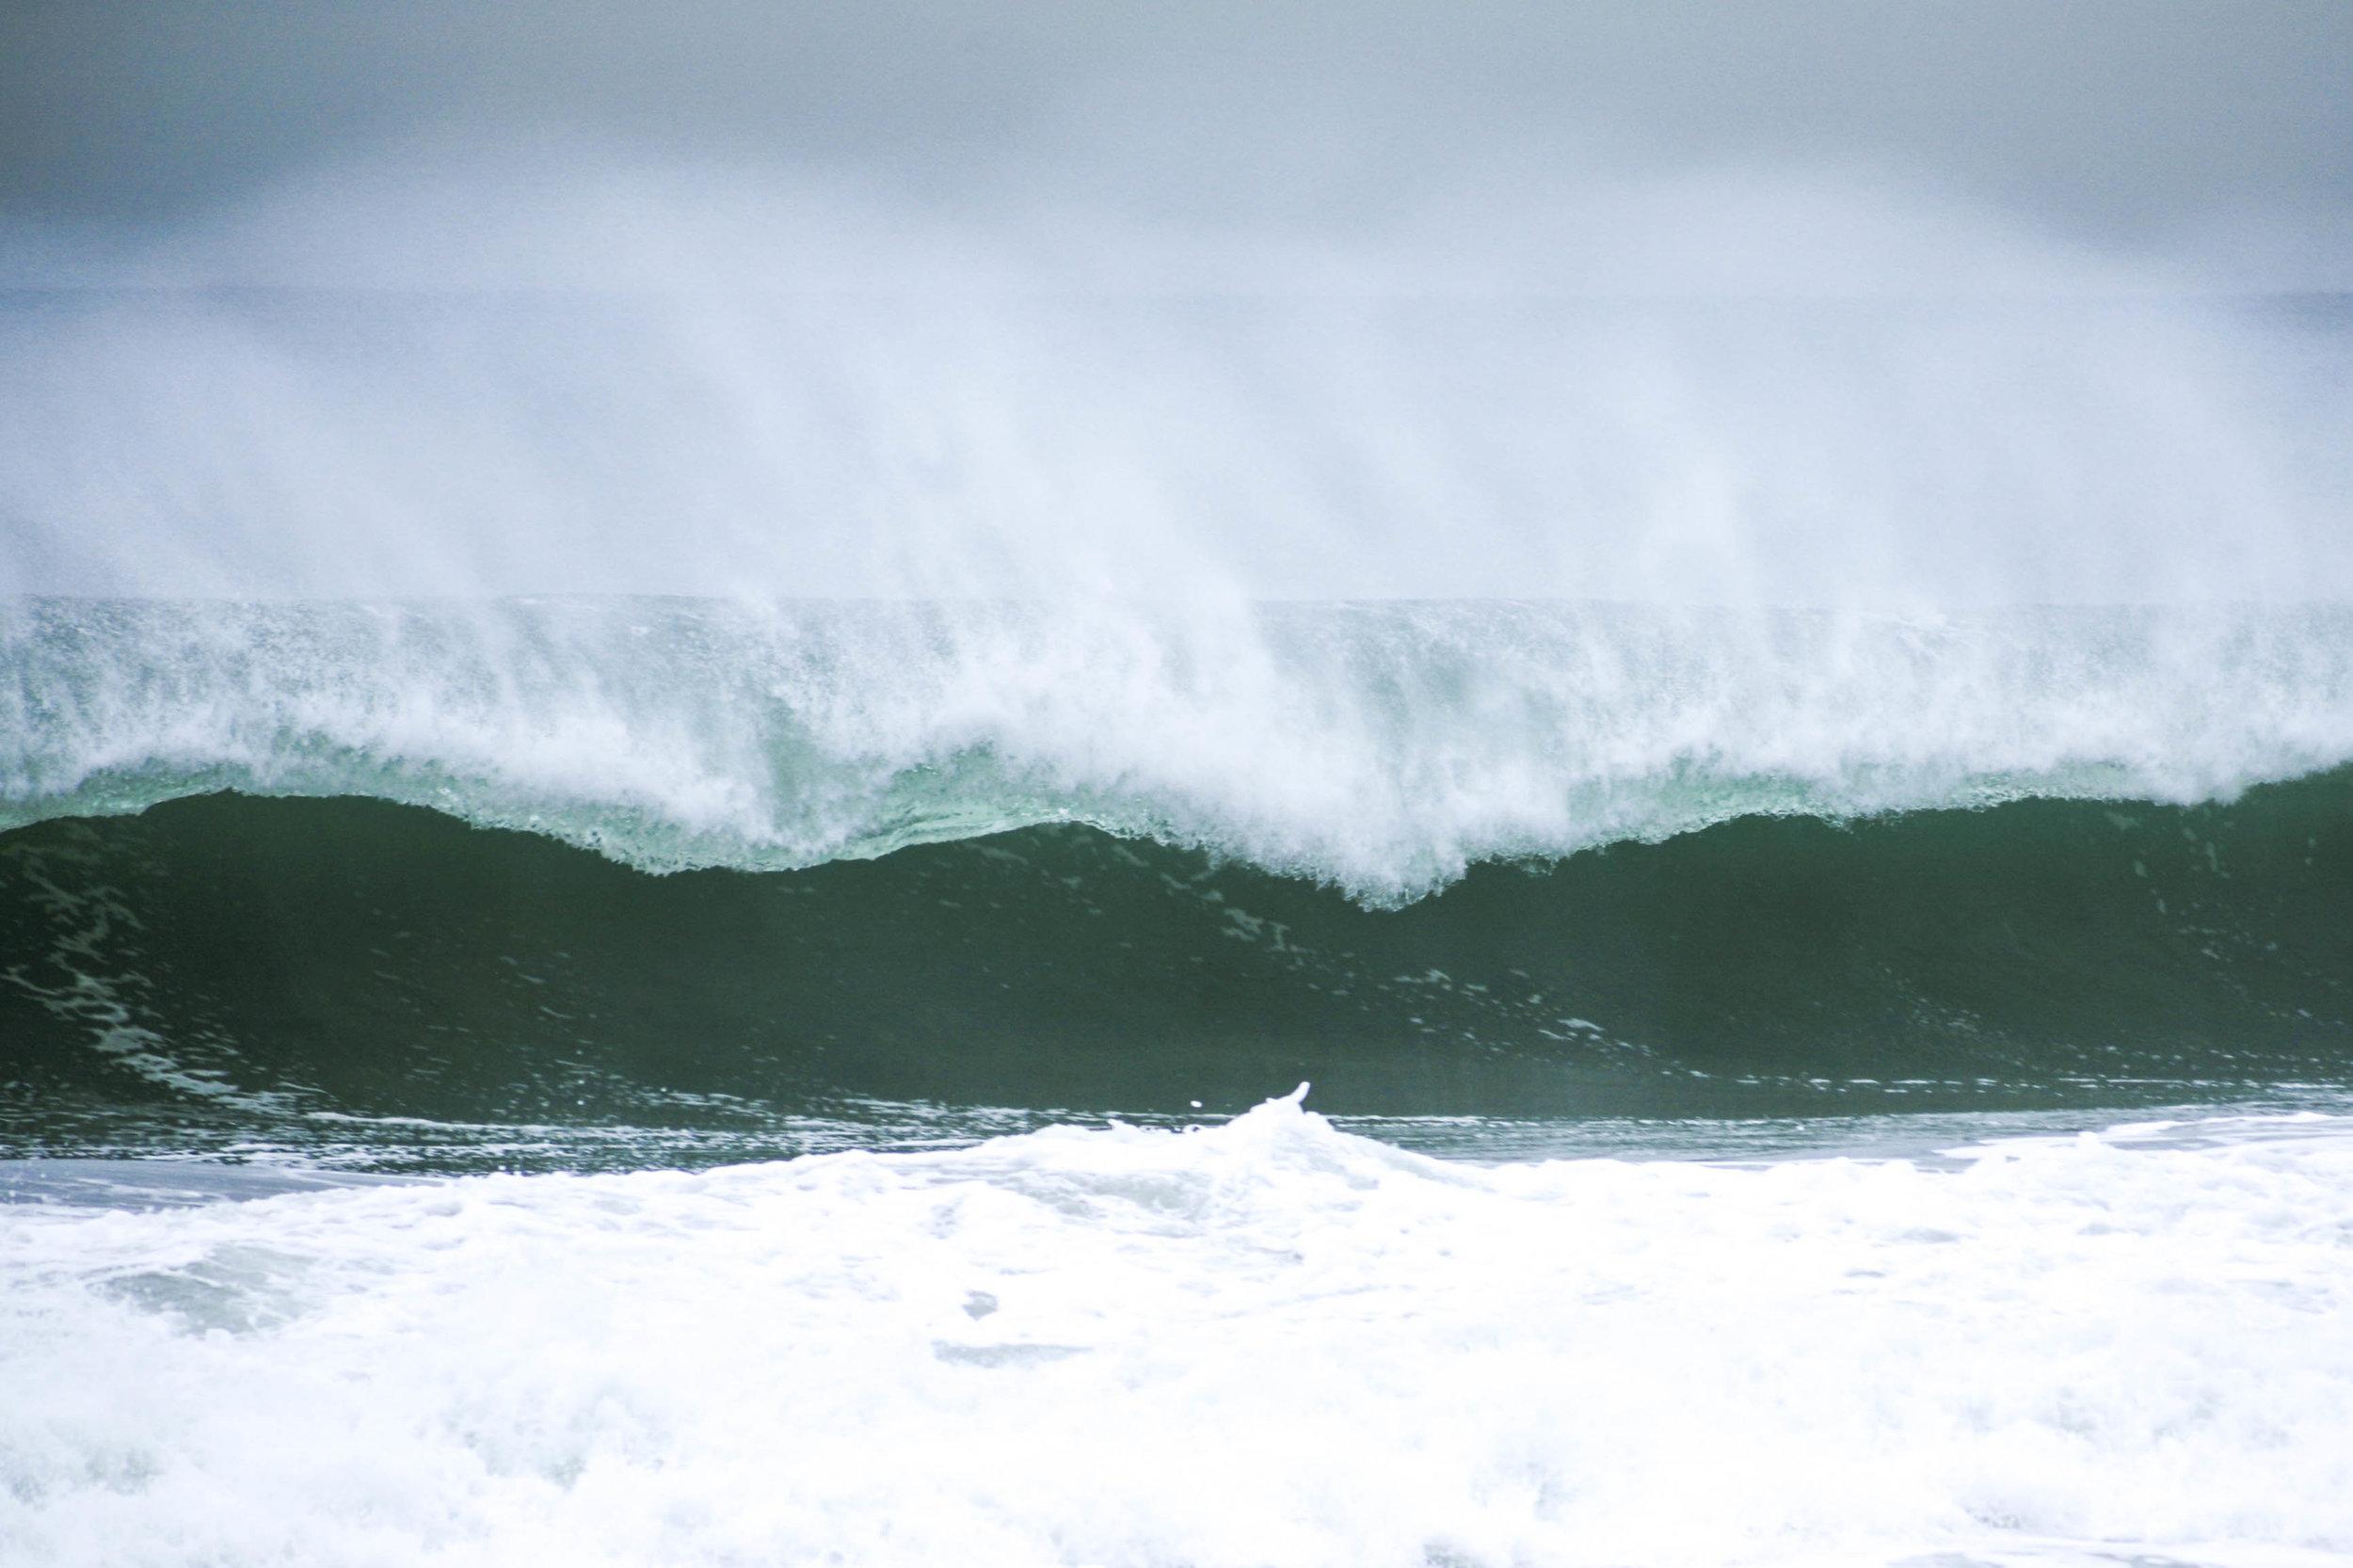 wave #7